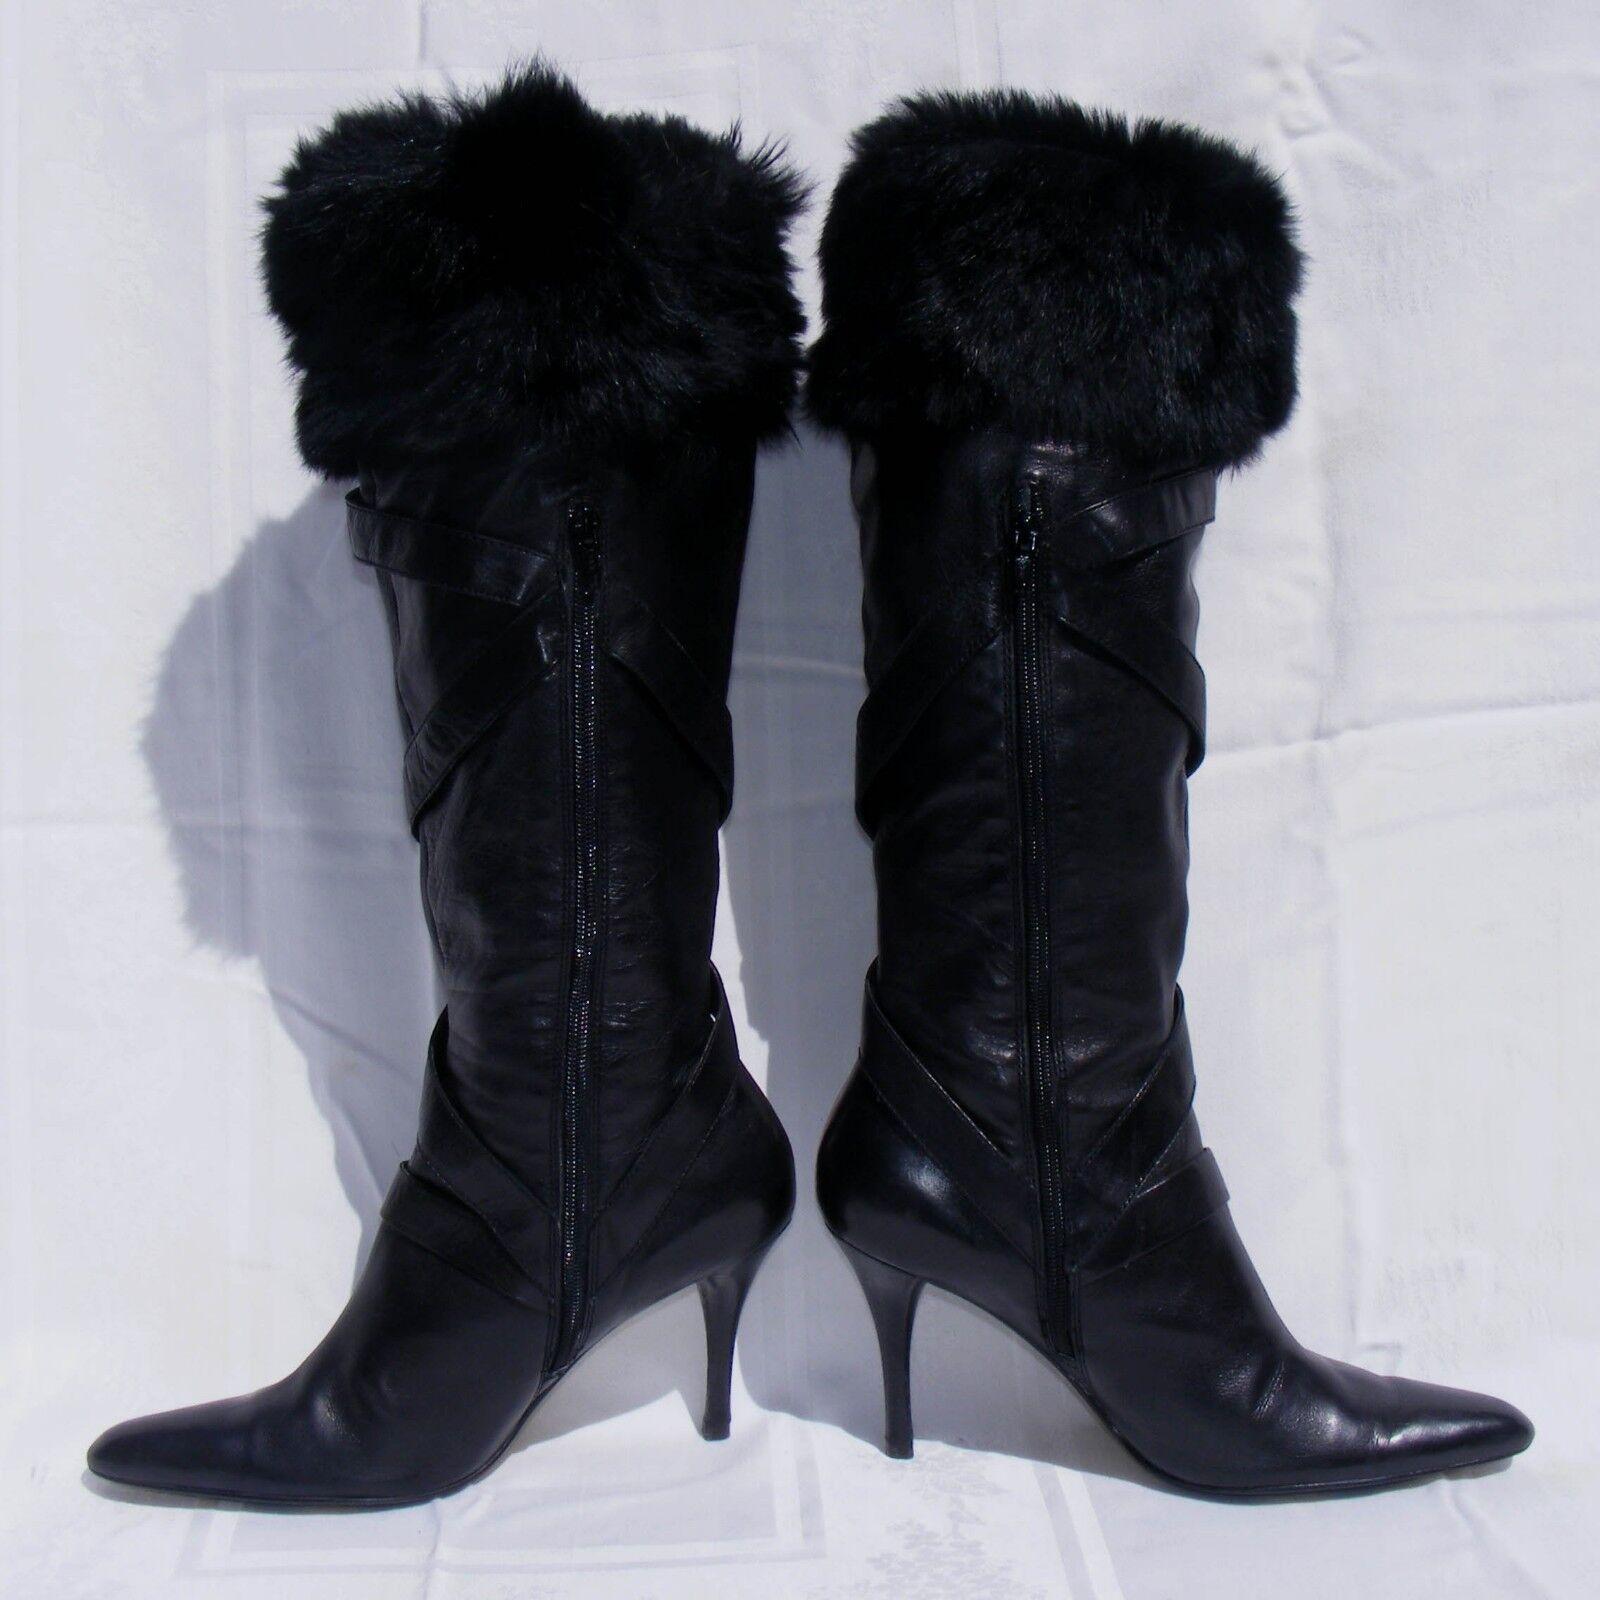 NINE WEST nero FASHION avvio, Leather Faux  Fur High talles, NWAnesia stivali 9.5M  elementi di novità